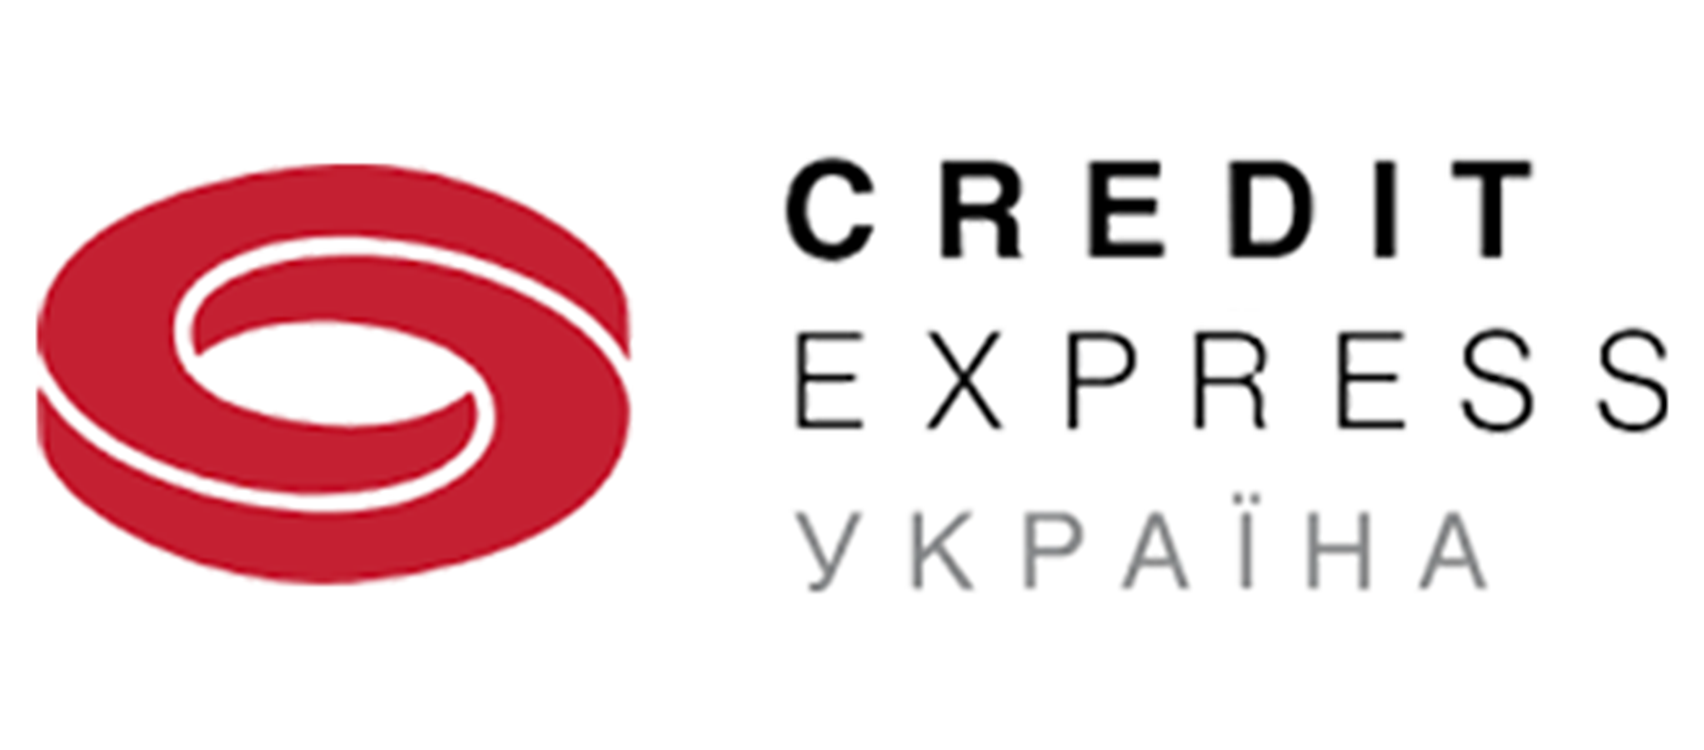 CreditExpress